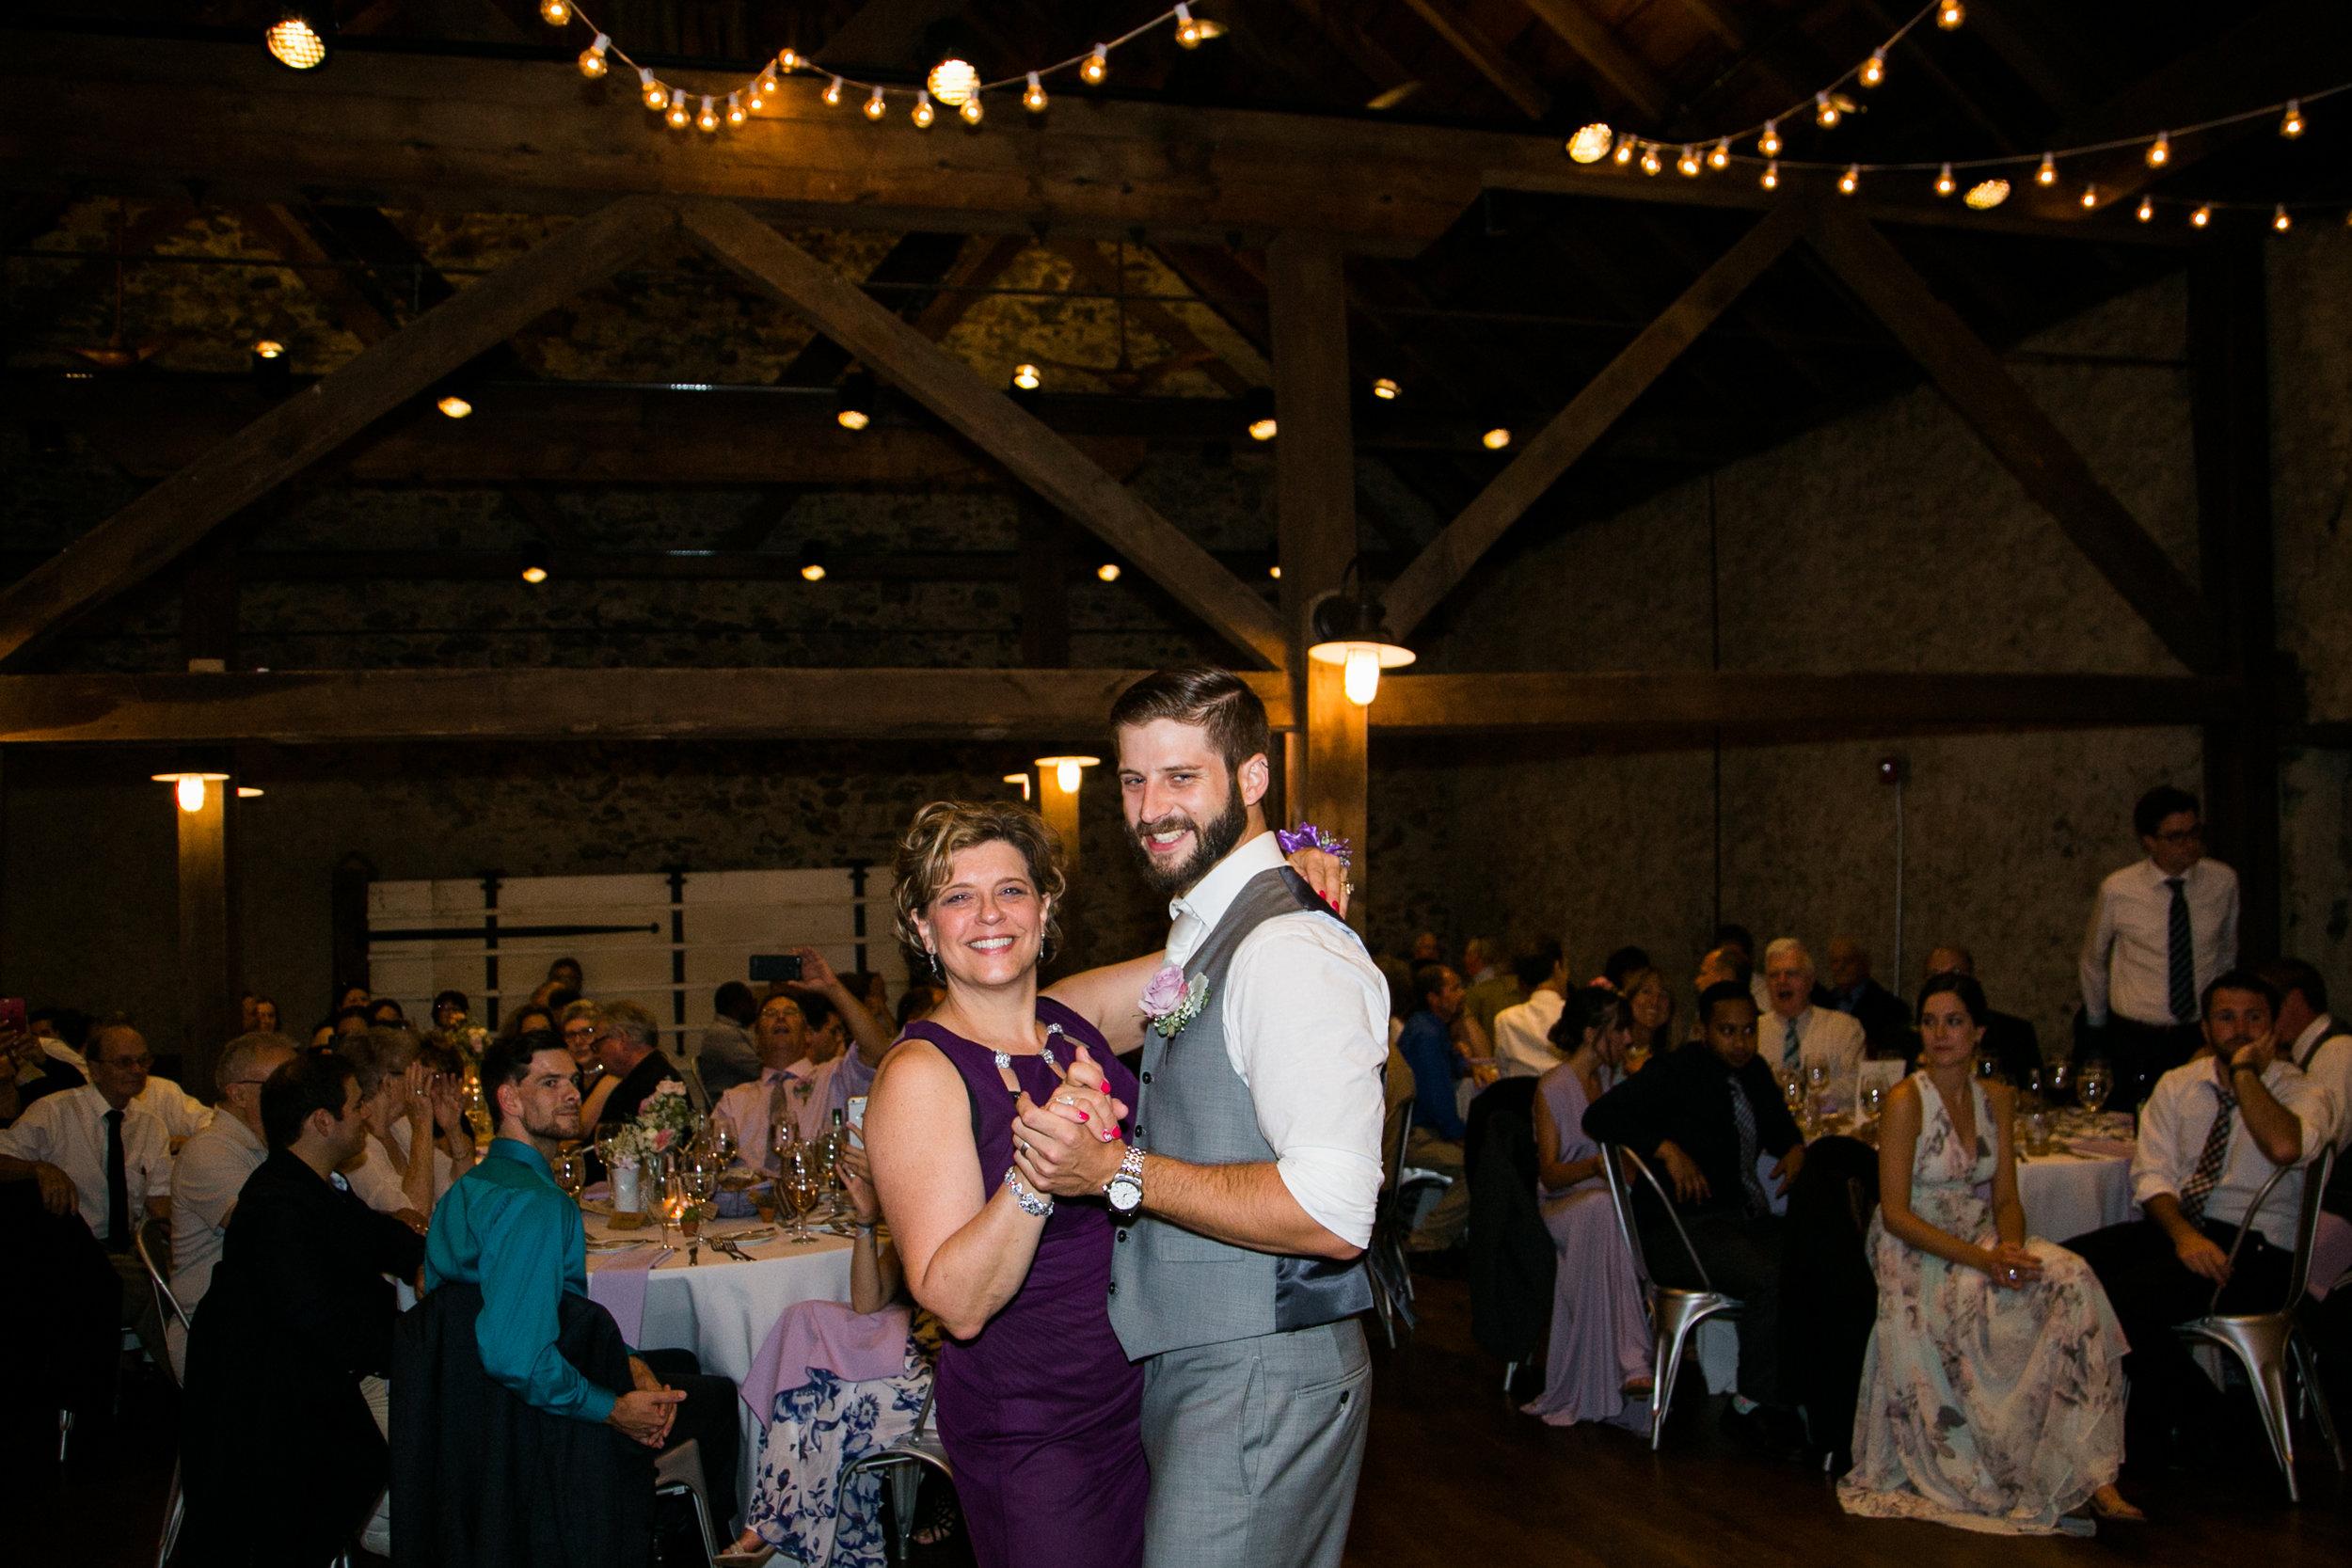 TYLER ARBORETUM WEDDING PHOTOGRAPHY LOVESTRUCK PICTURES-085.jpg